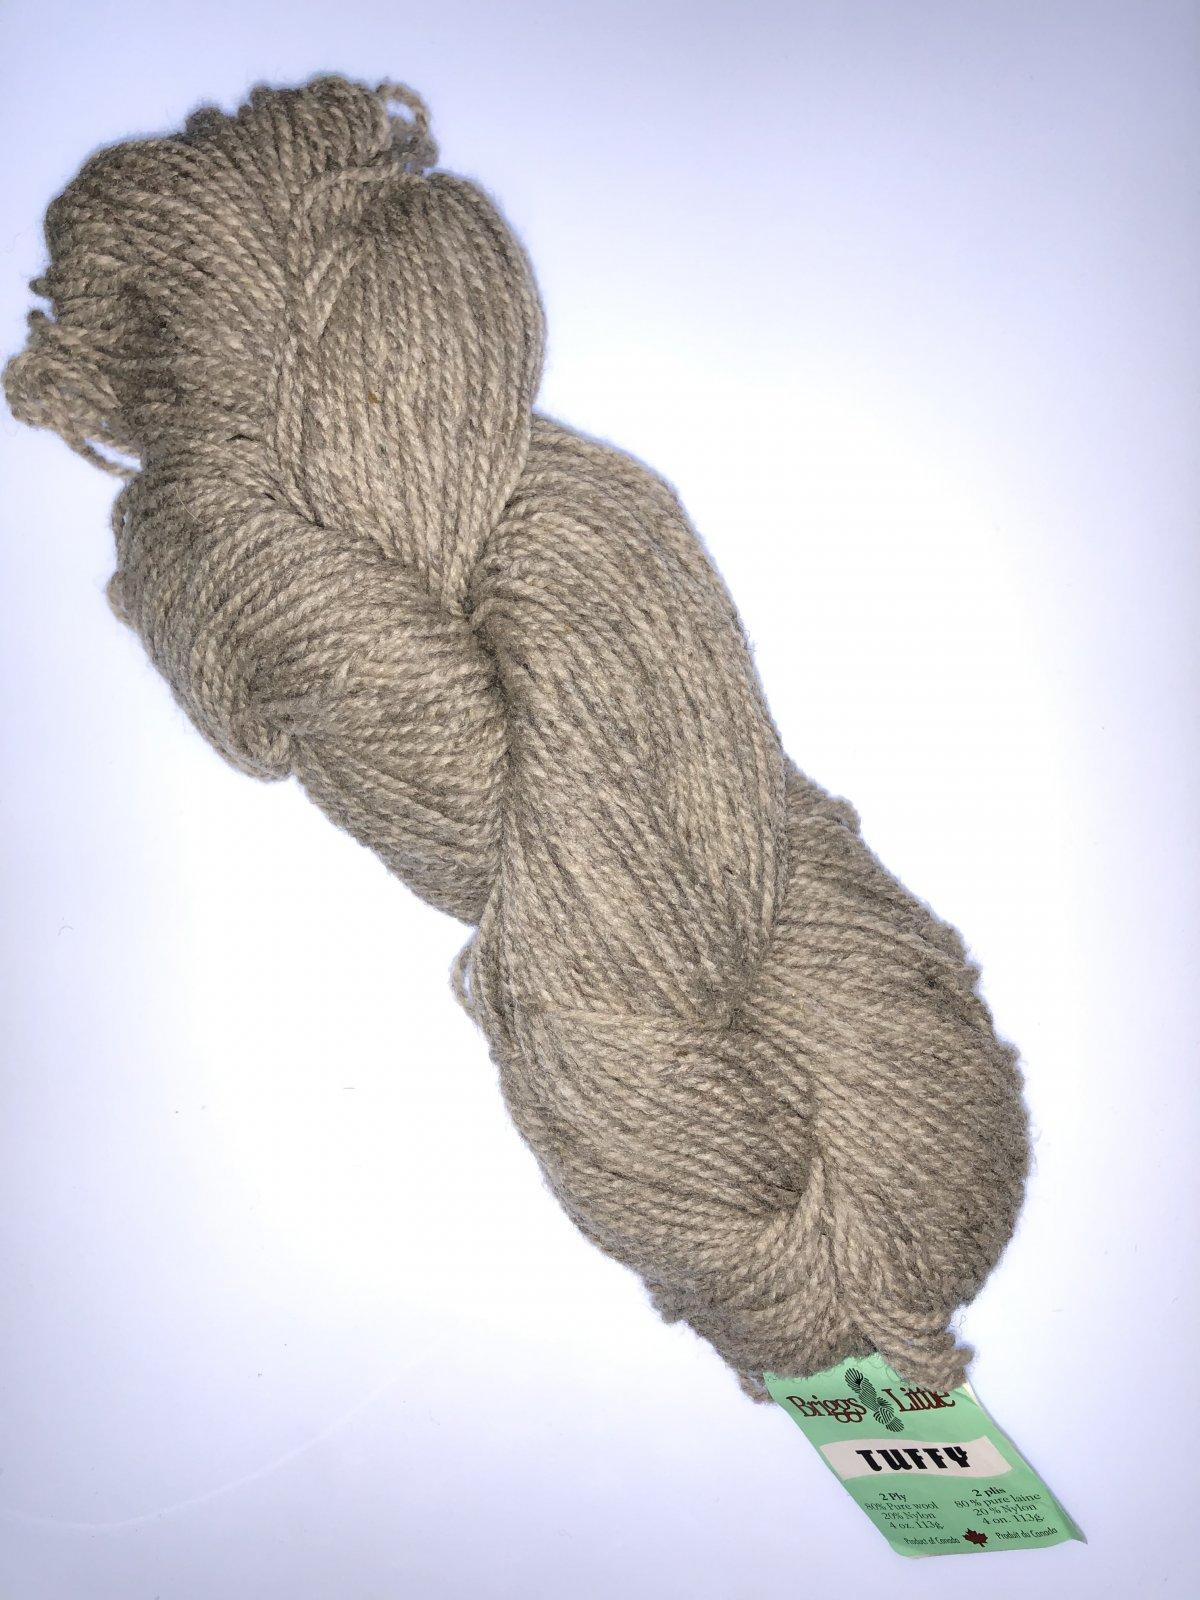 Tuffy 2 Ply 4oz (113g) 80% Wool 20% Nylon Worsted/Aran Yarn Oatmeal